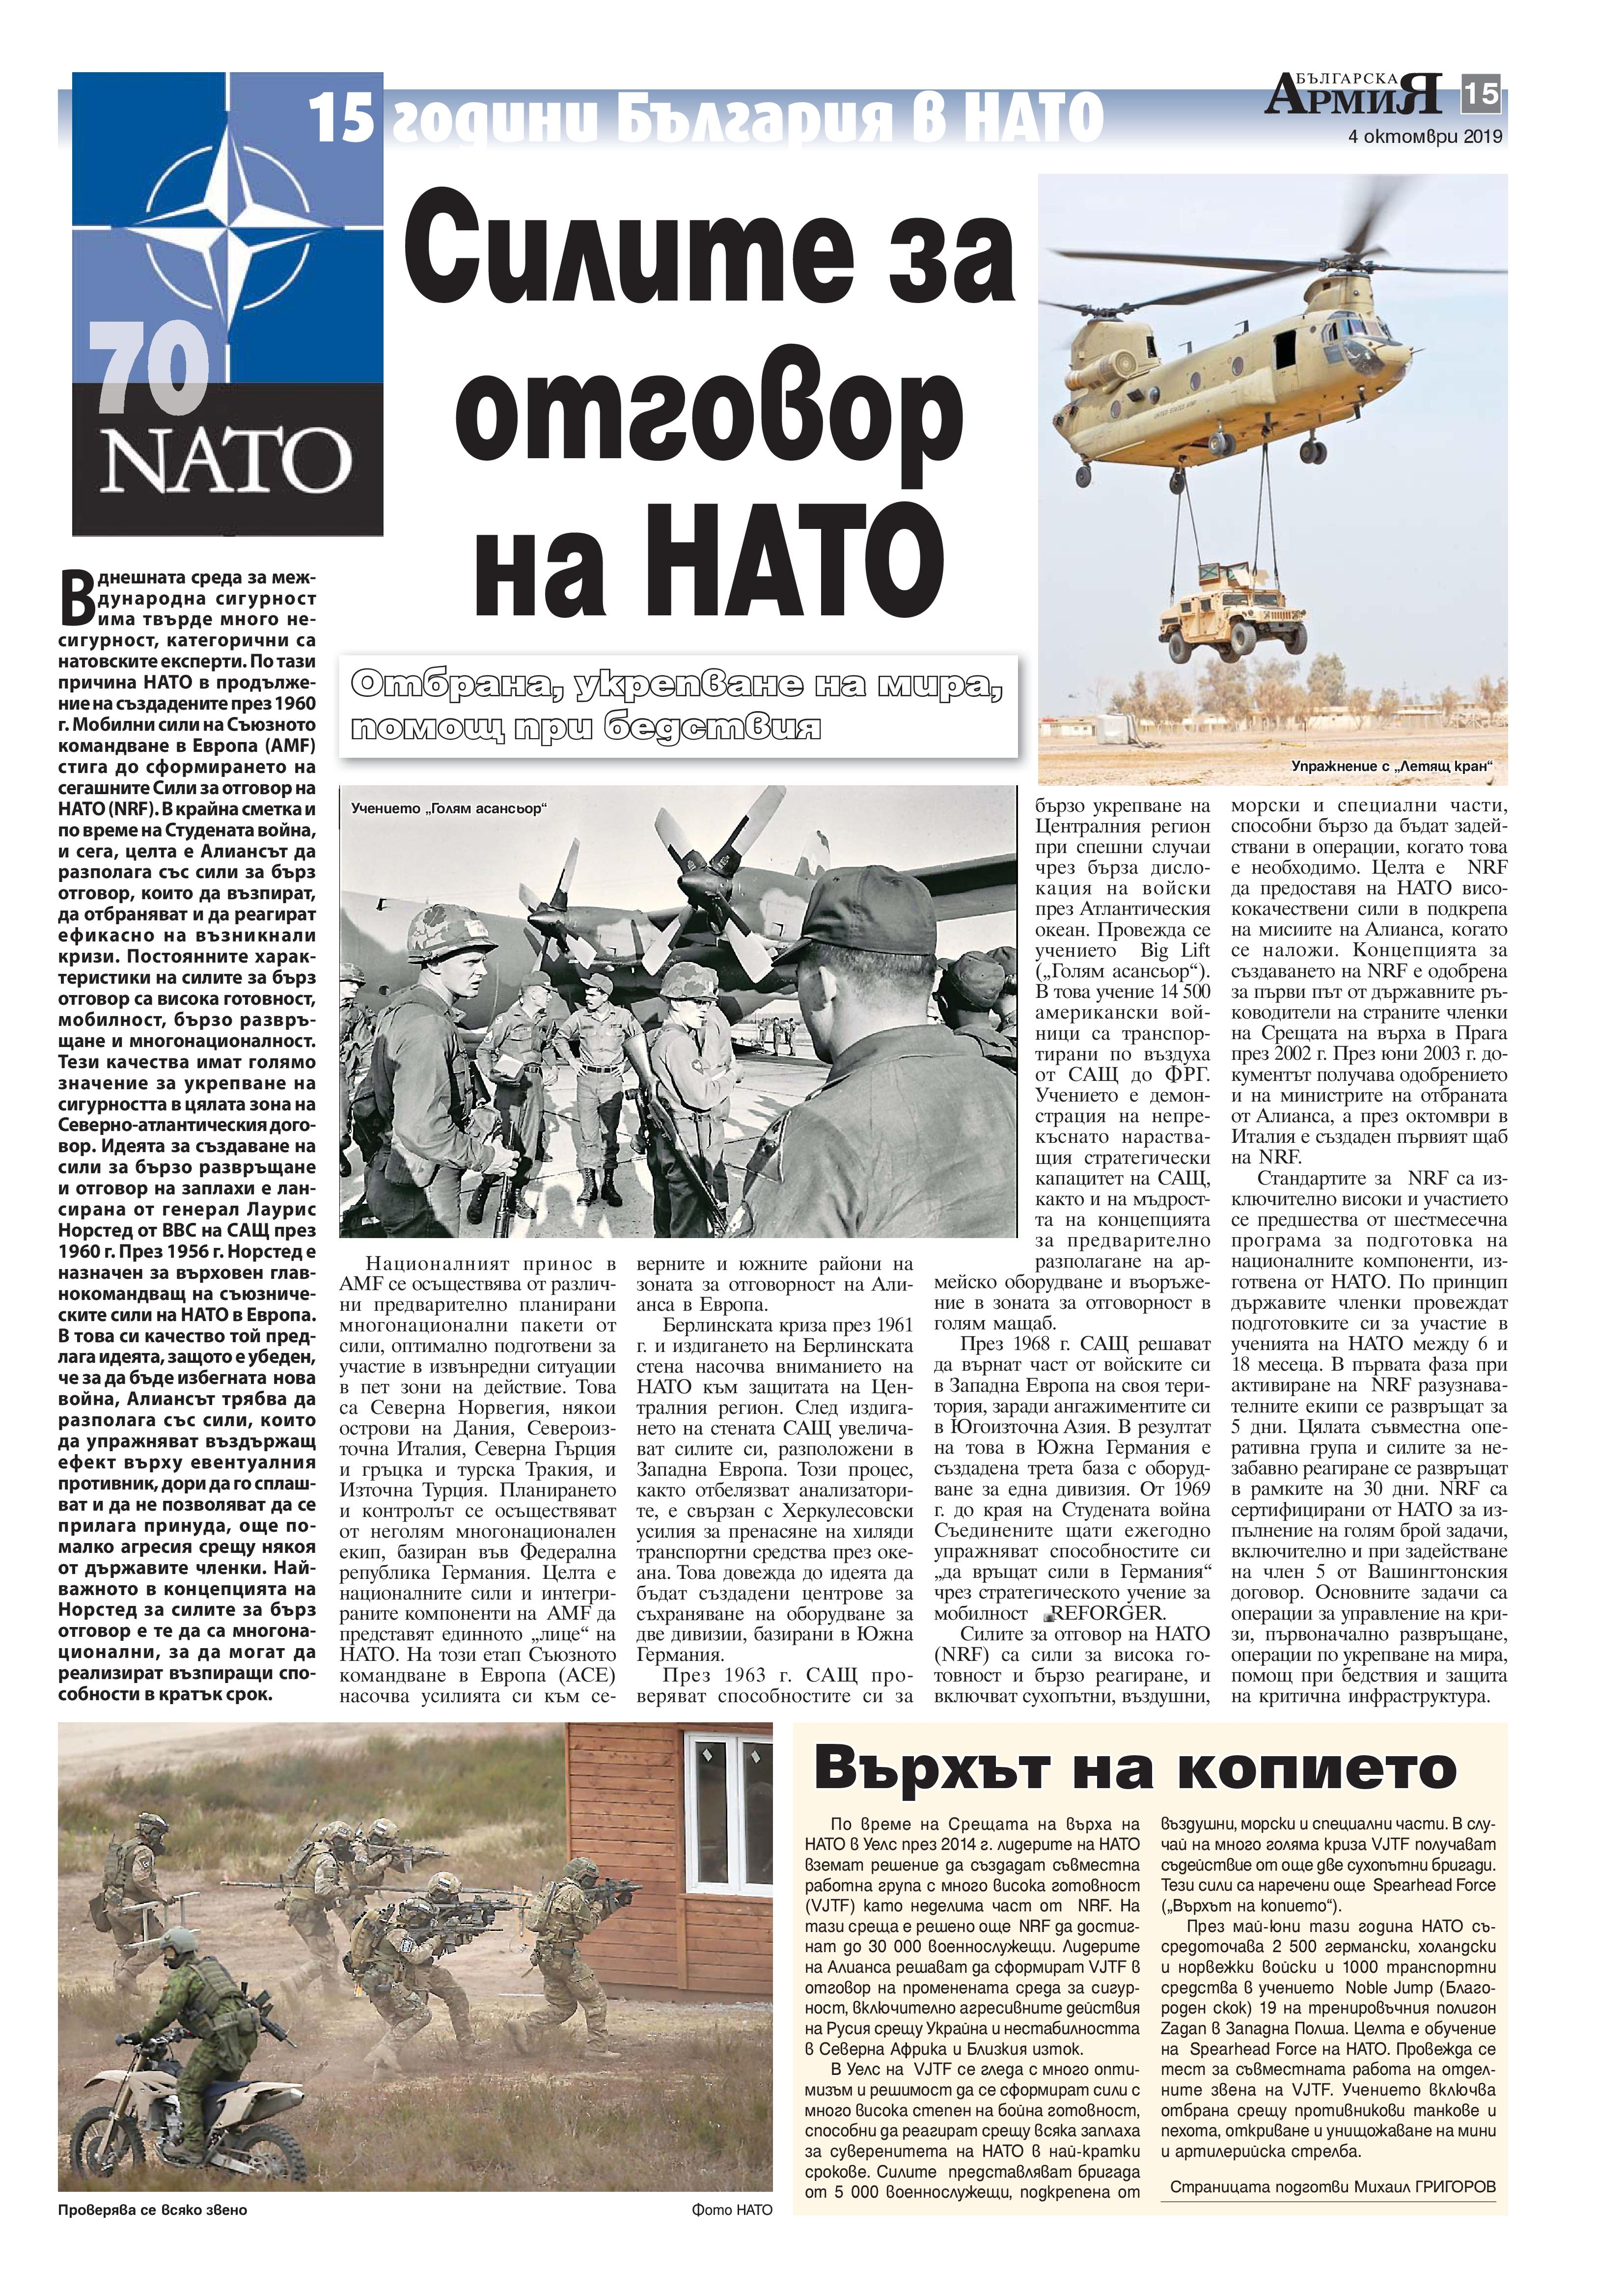 https://www.armymedia.bg/wp-content/uploads/2015/06/15-33.jpg